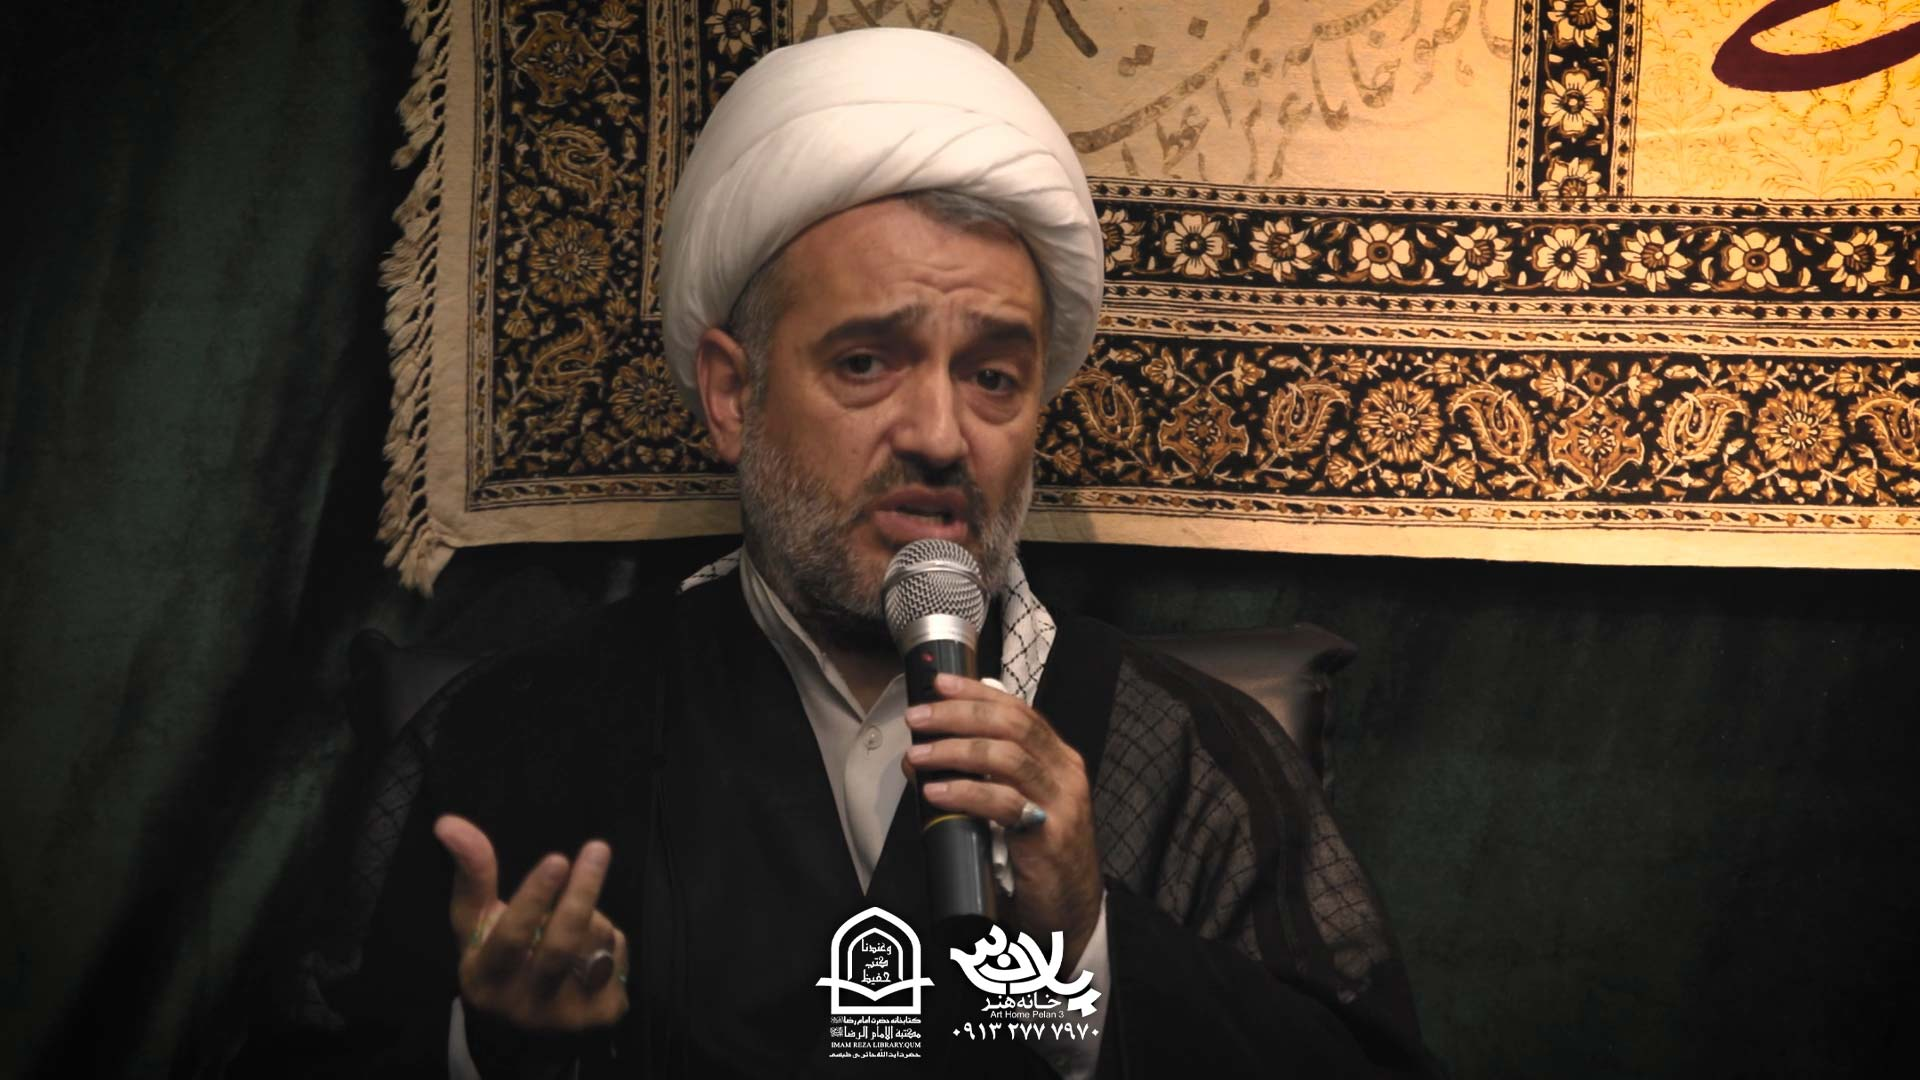 کرونا و هیئات محمد میرزامحمدی